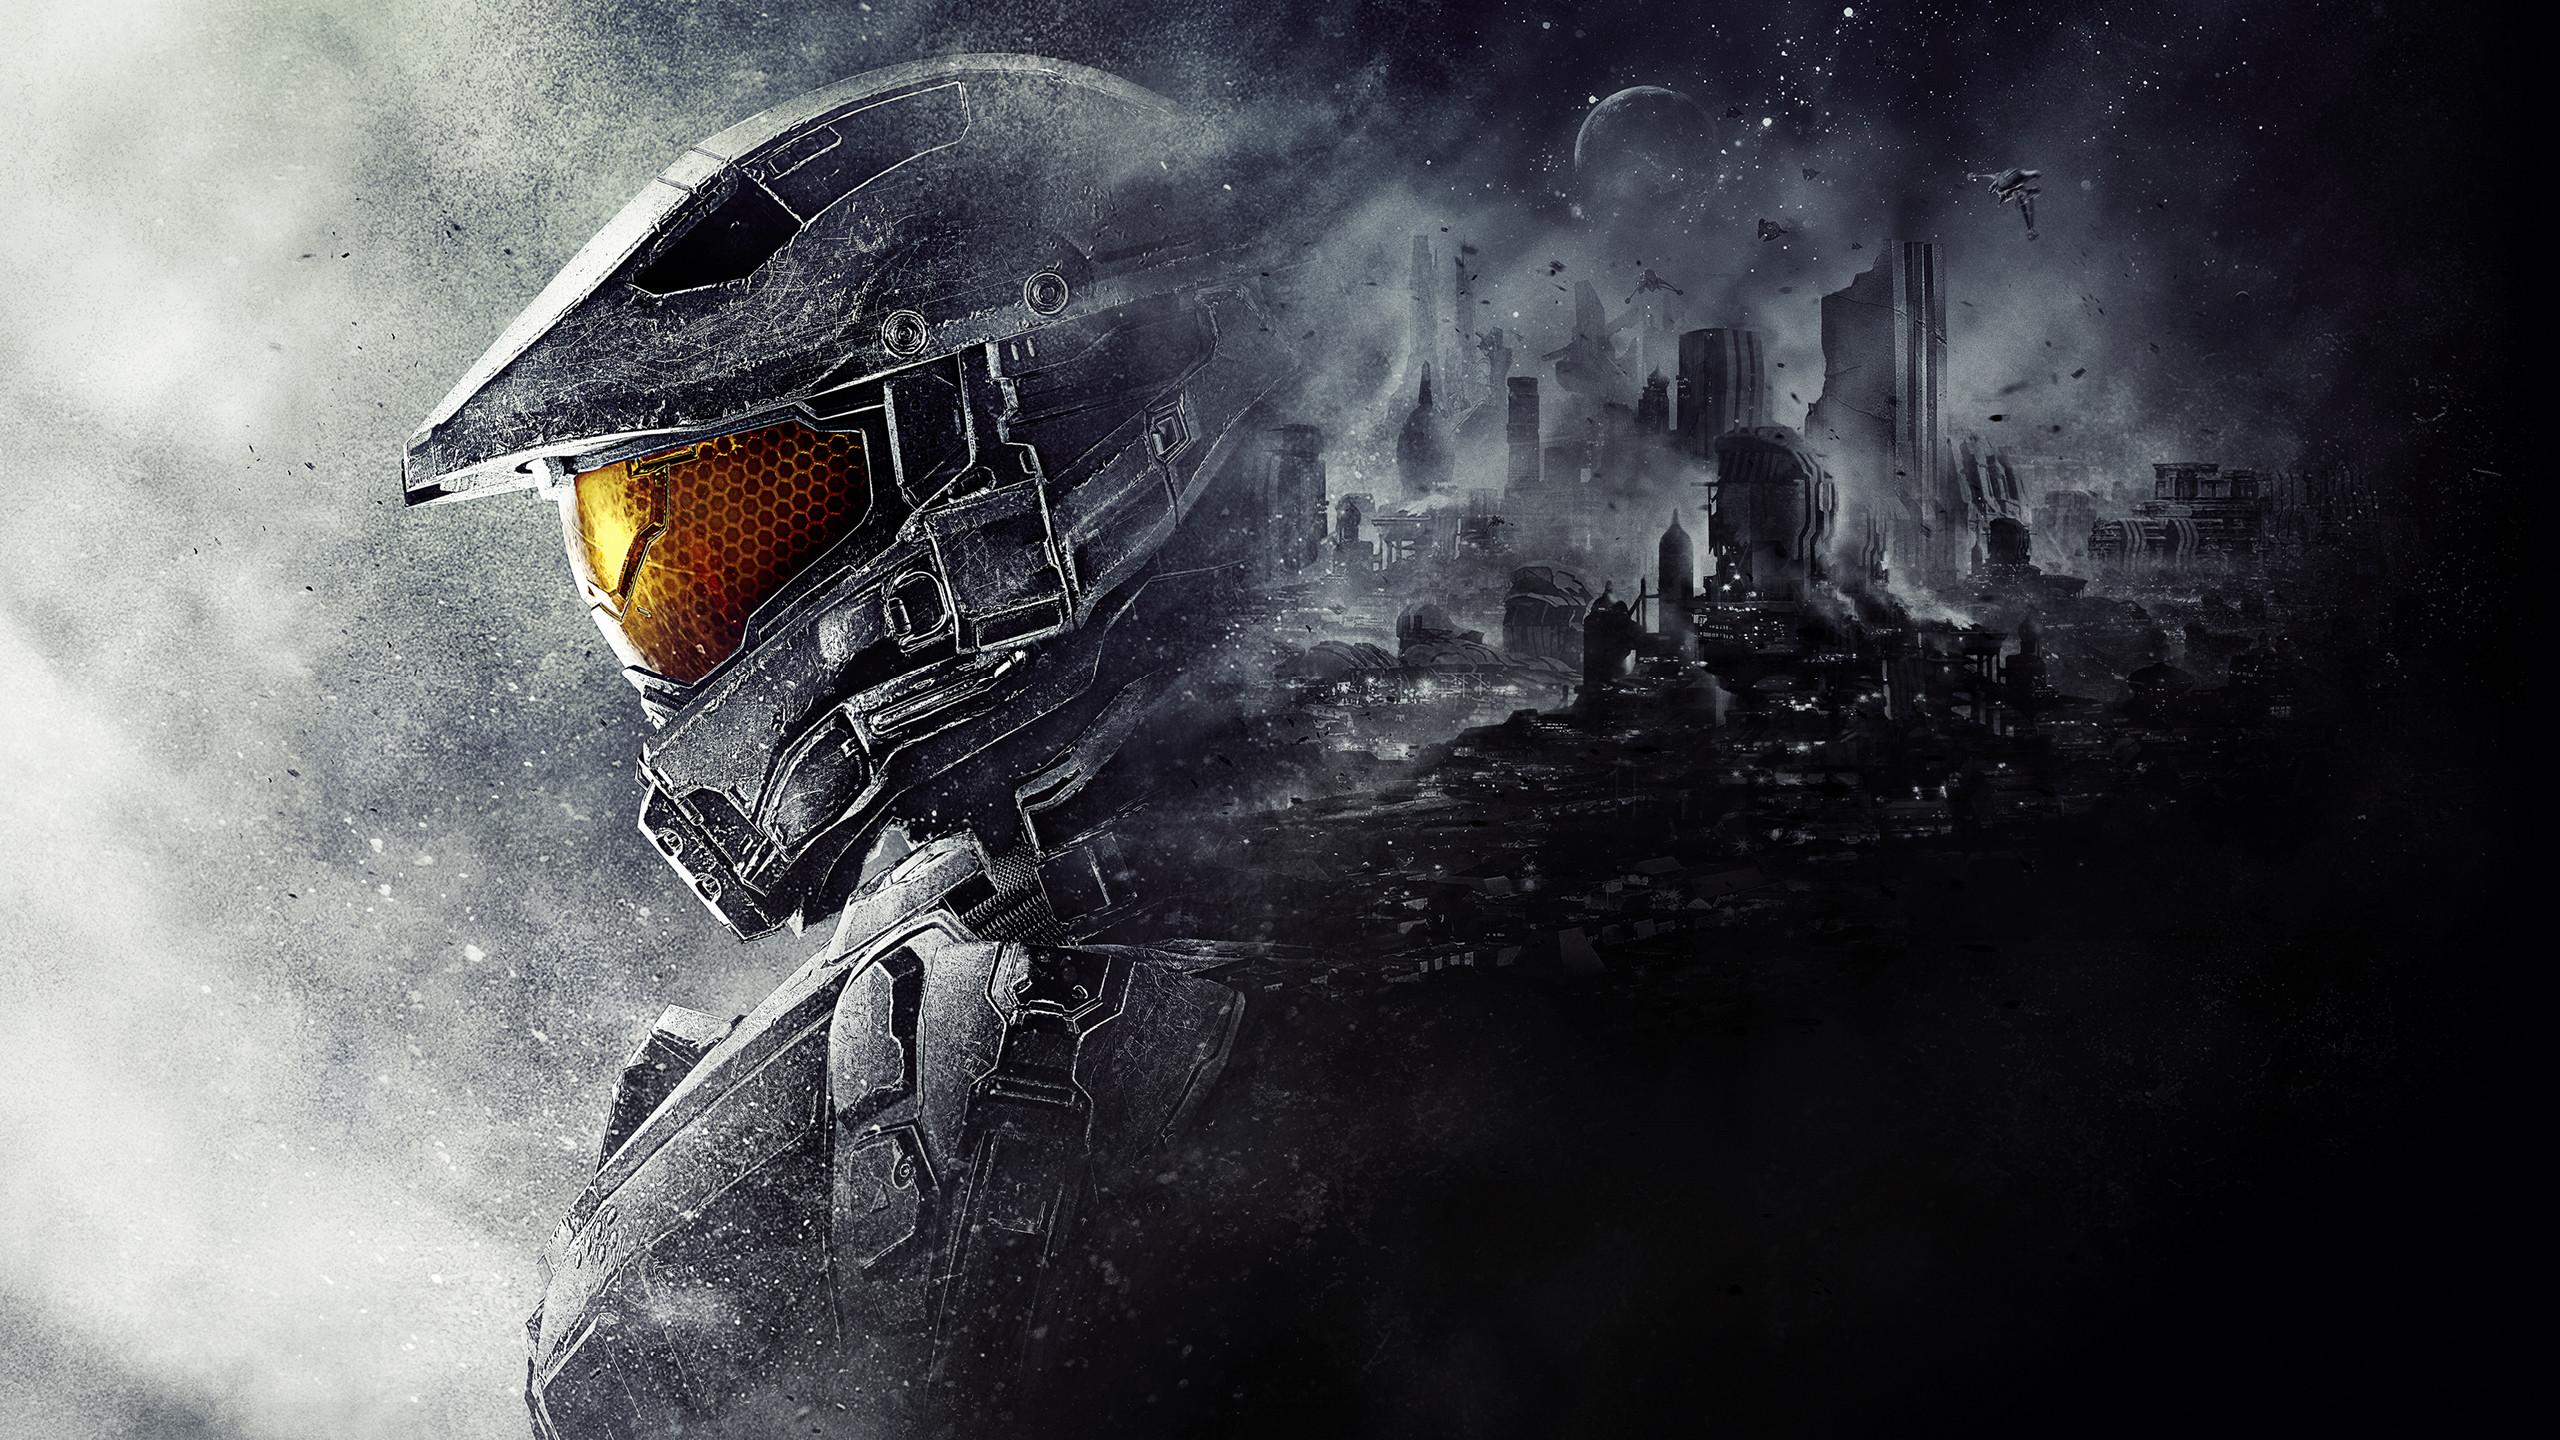 Master Chief Halo 5 Guardians